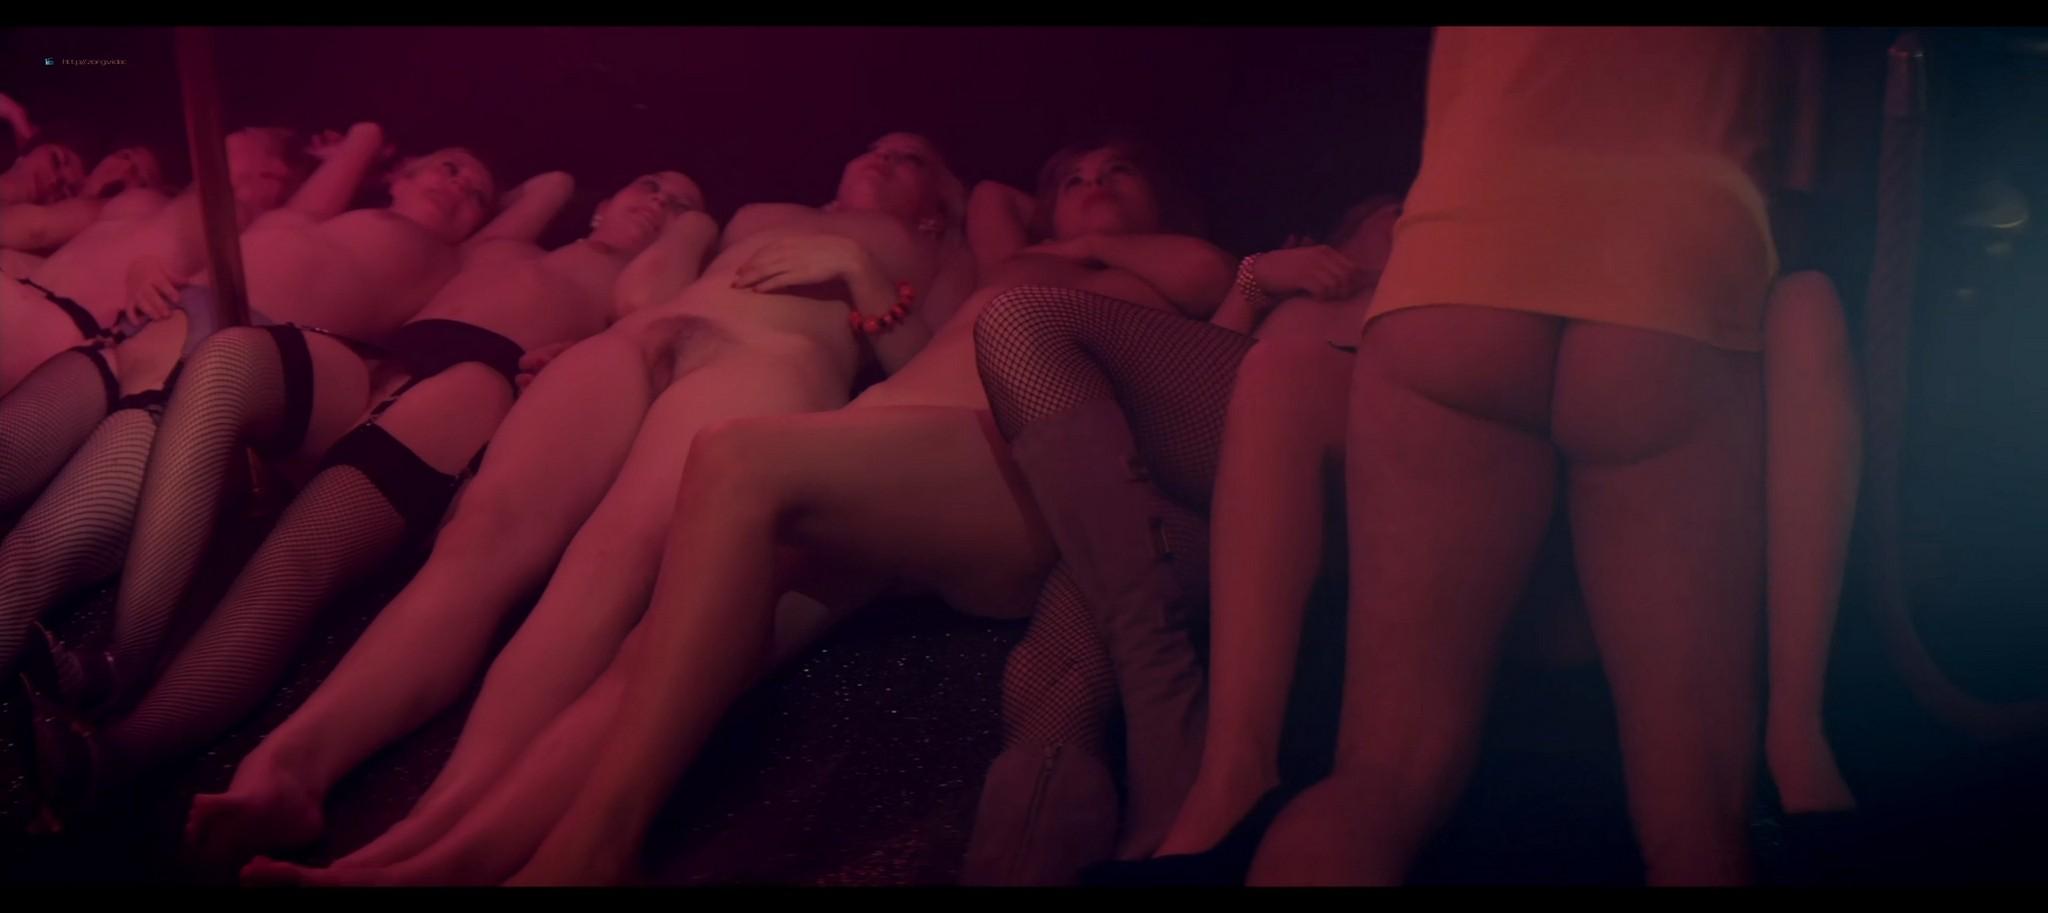 Camilla Cornelia Lehmann nude Sarahsita Lassen, nude and explicit body parts - Spies Og Glistrup (DK-2013) HD 1080p BluRay (15)